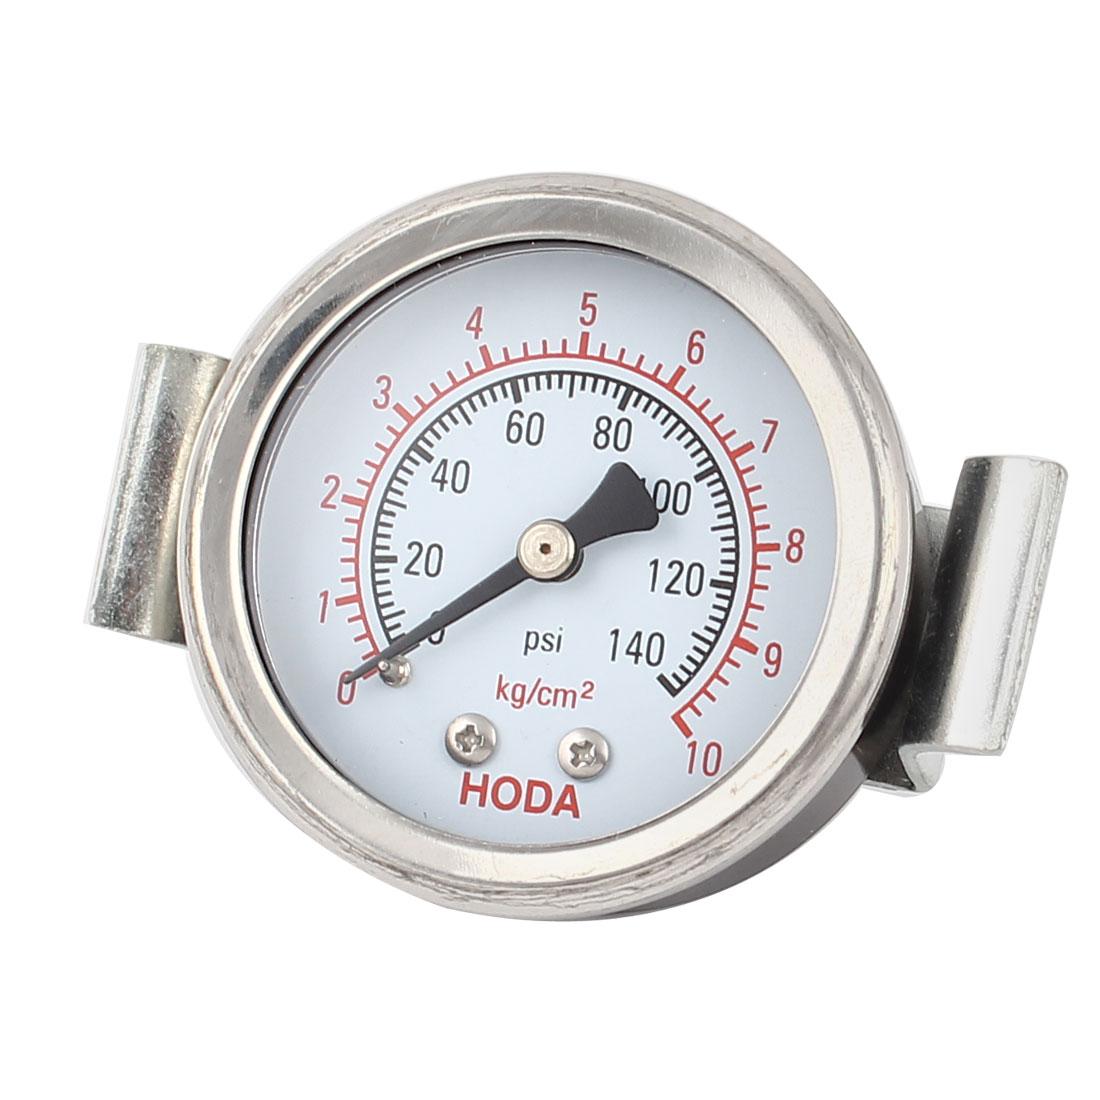 Air Compressor 6.4mm Thread Connector 0-10Kg/cm2 0-140psi Measure Pressure Gauge